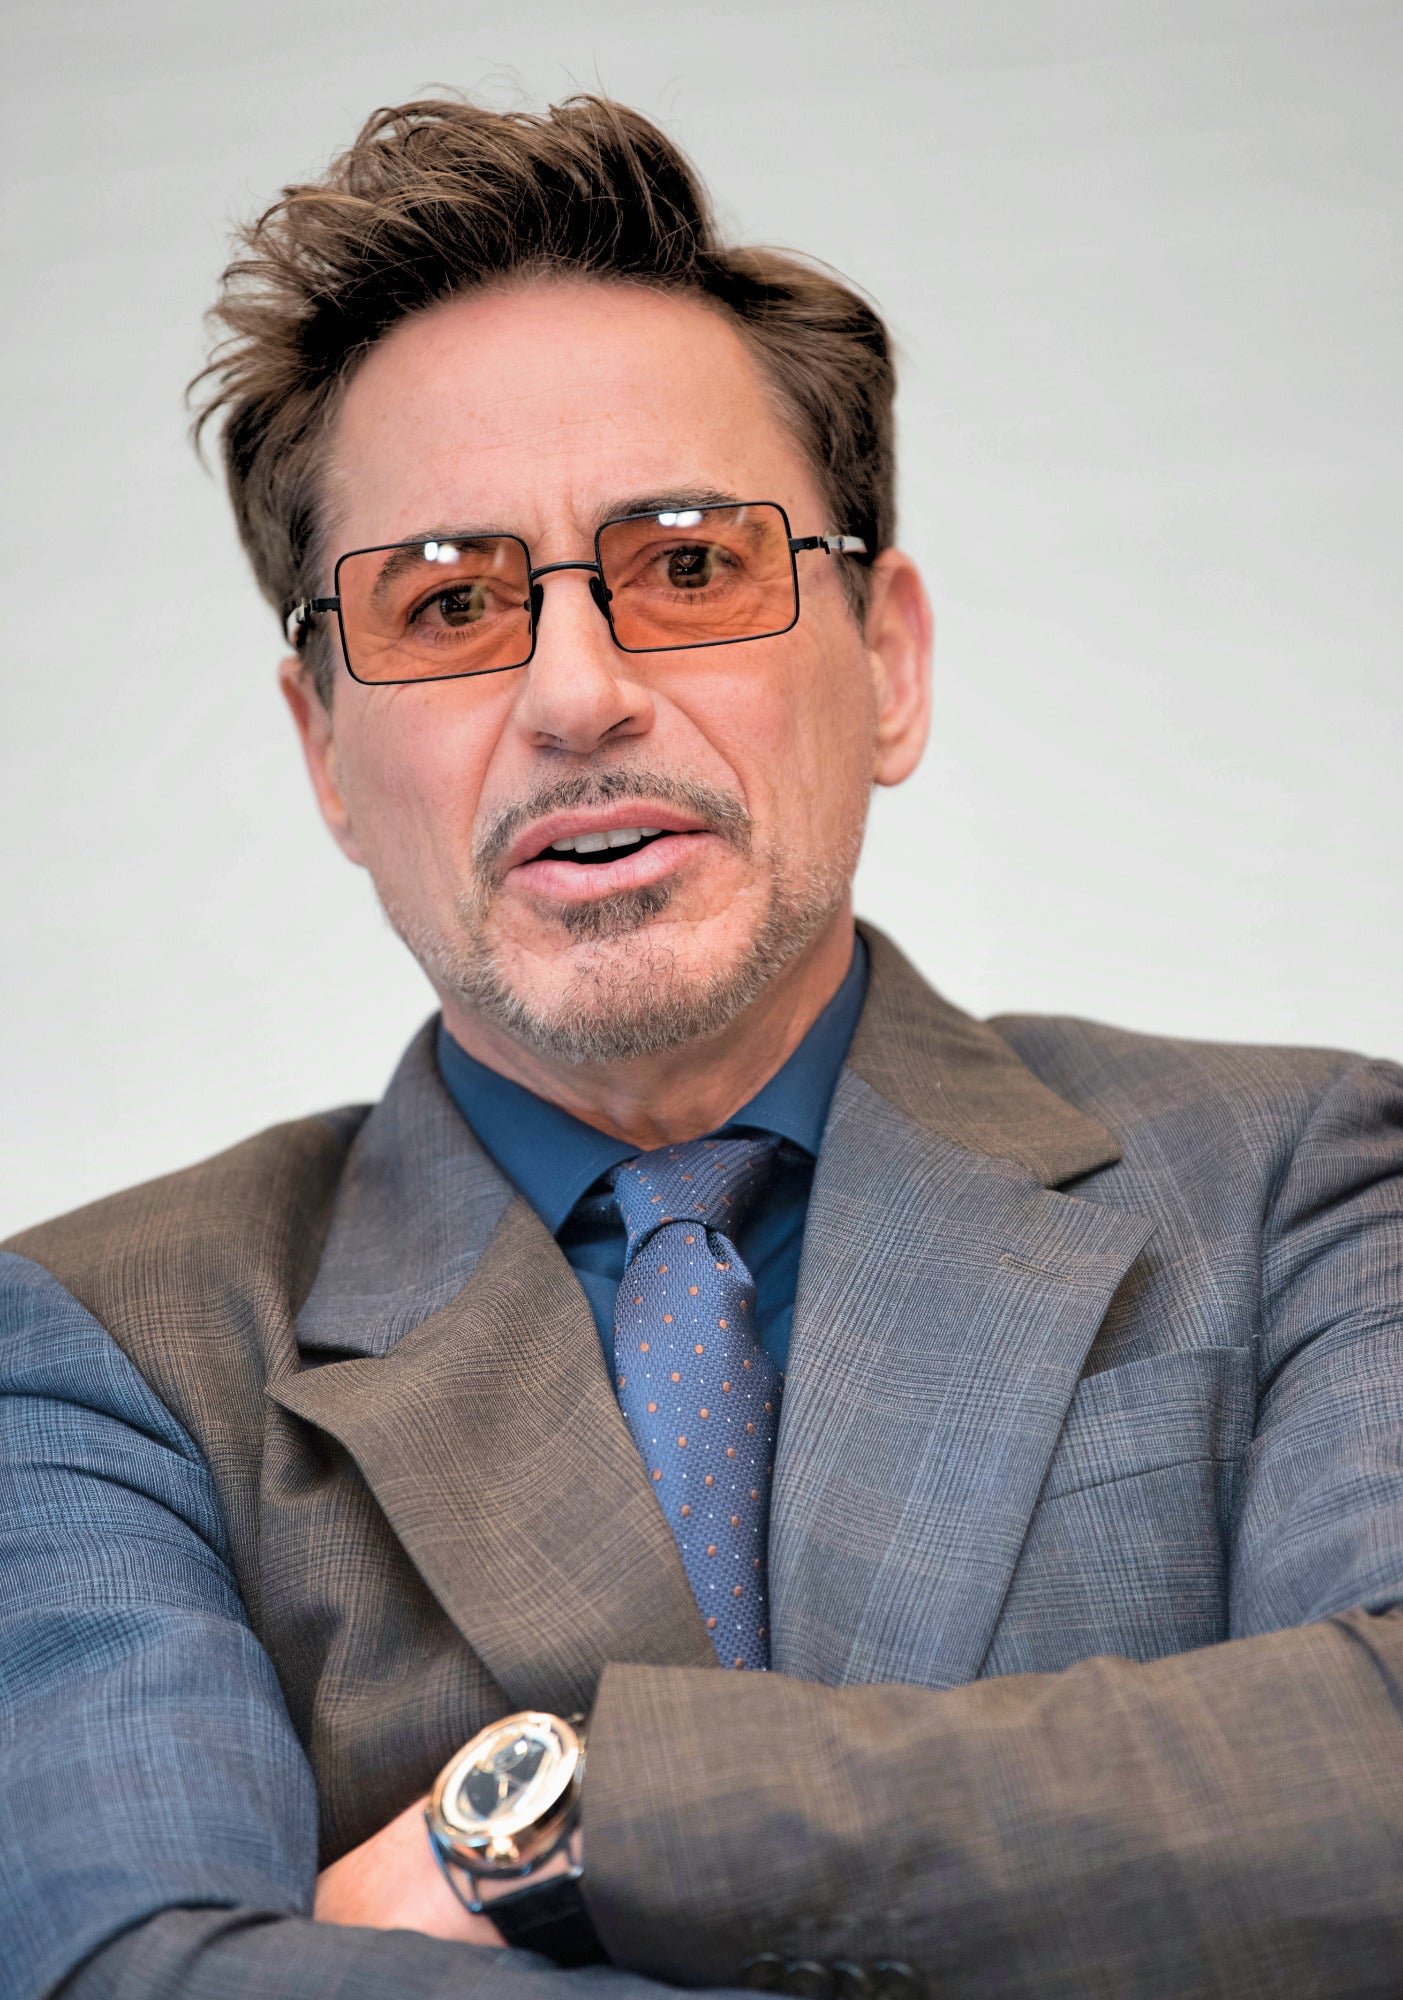 Actor and producer Robert Downey Jr. Golden Globe winner